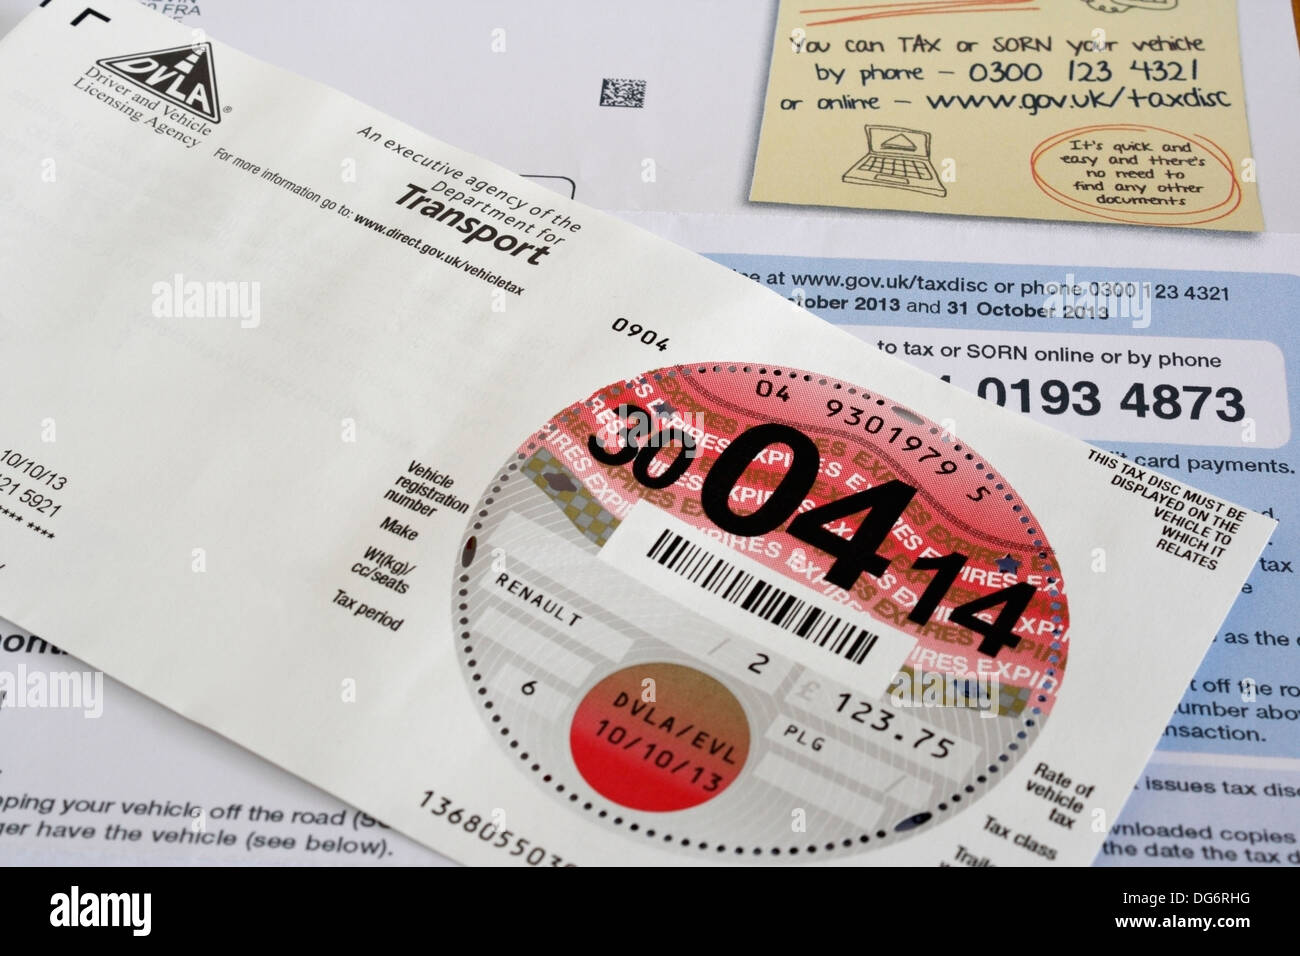 UK car tax disc and renewal form - Stock Image